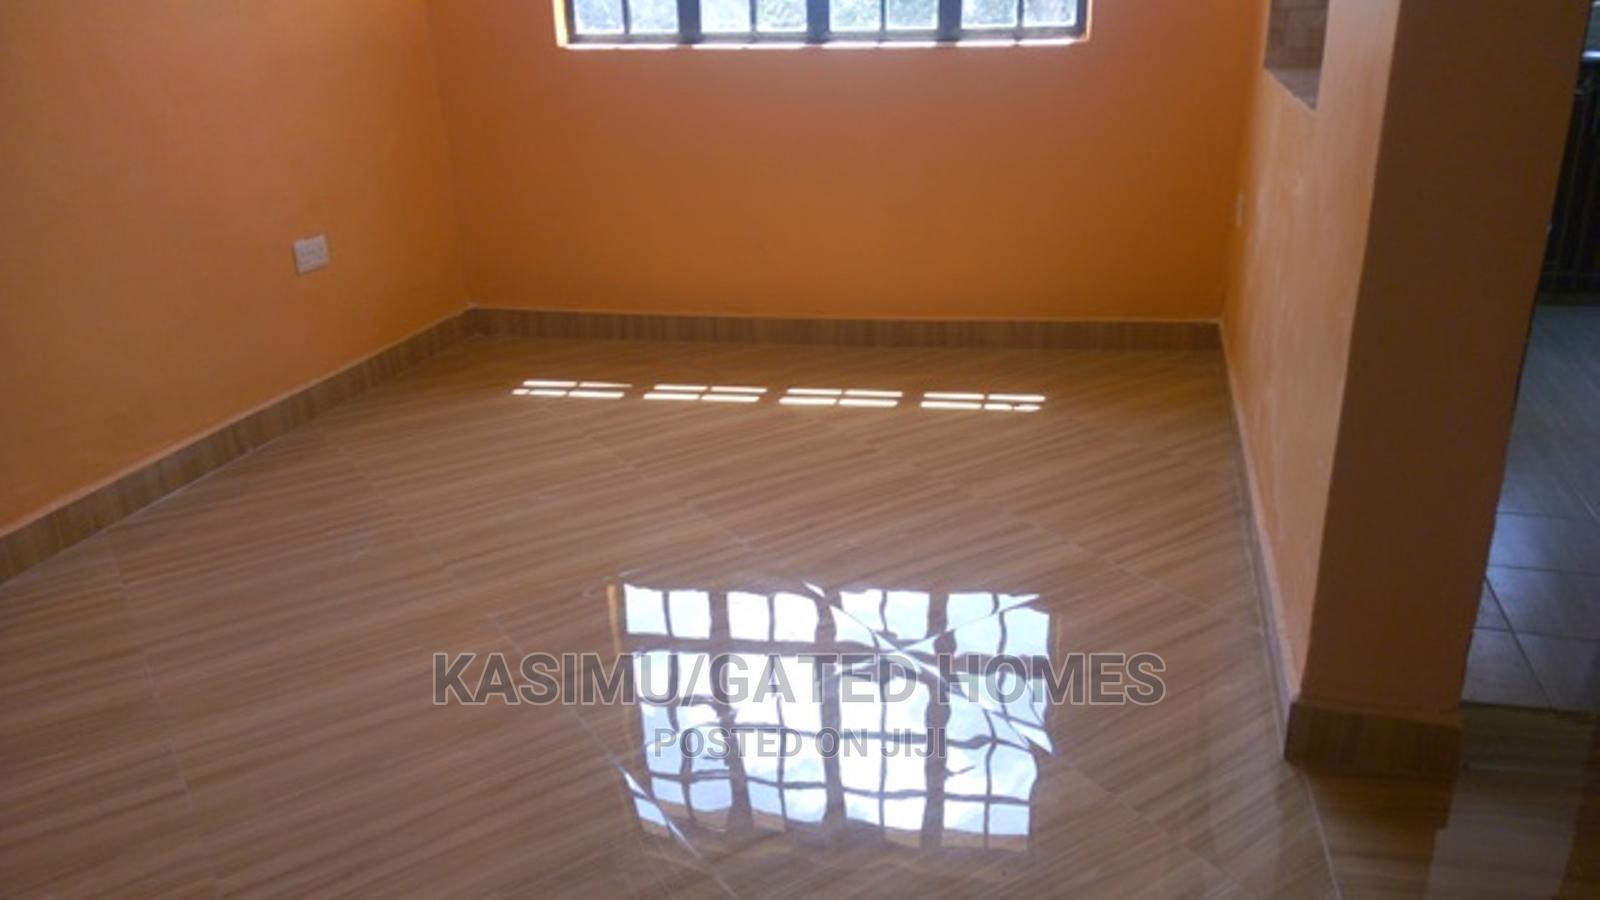 Kitengela 3 Bedroom House for Rent in a Gated Community | Houses & Apartments For Rent for sale in Kitengela, Kajiado, Kenya